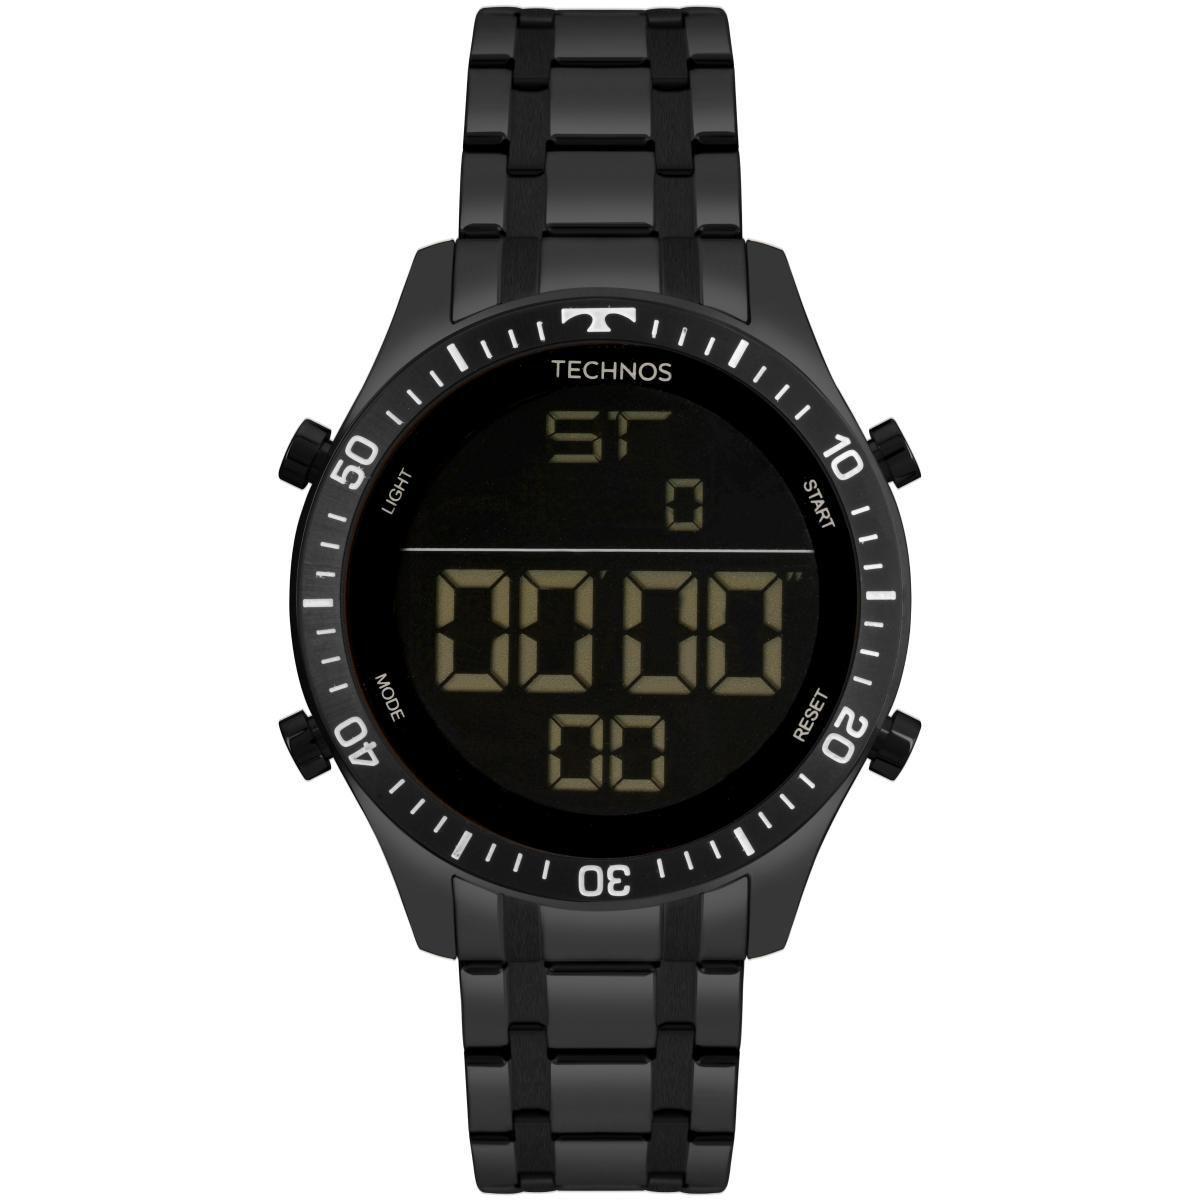 Relógio Masculino Technos T02139AB/4P 46mm Aço Preto